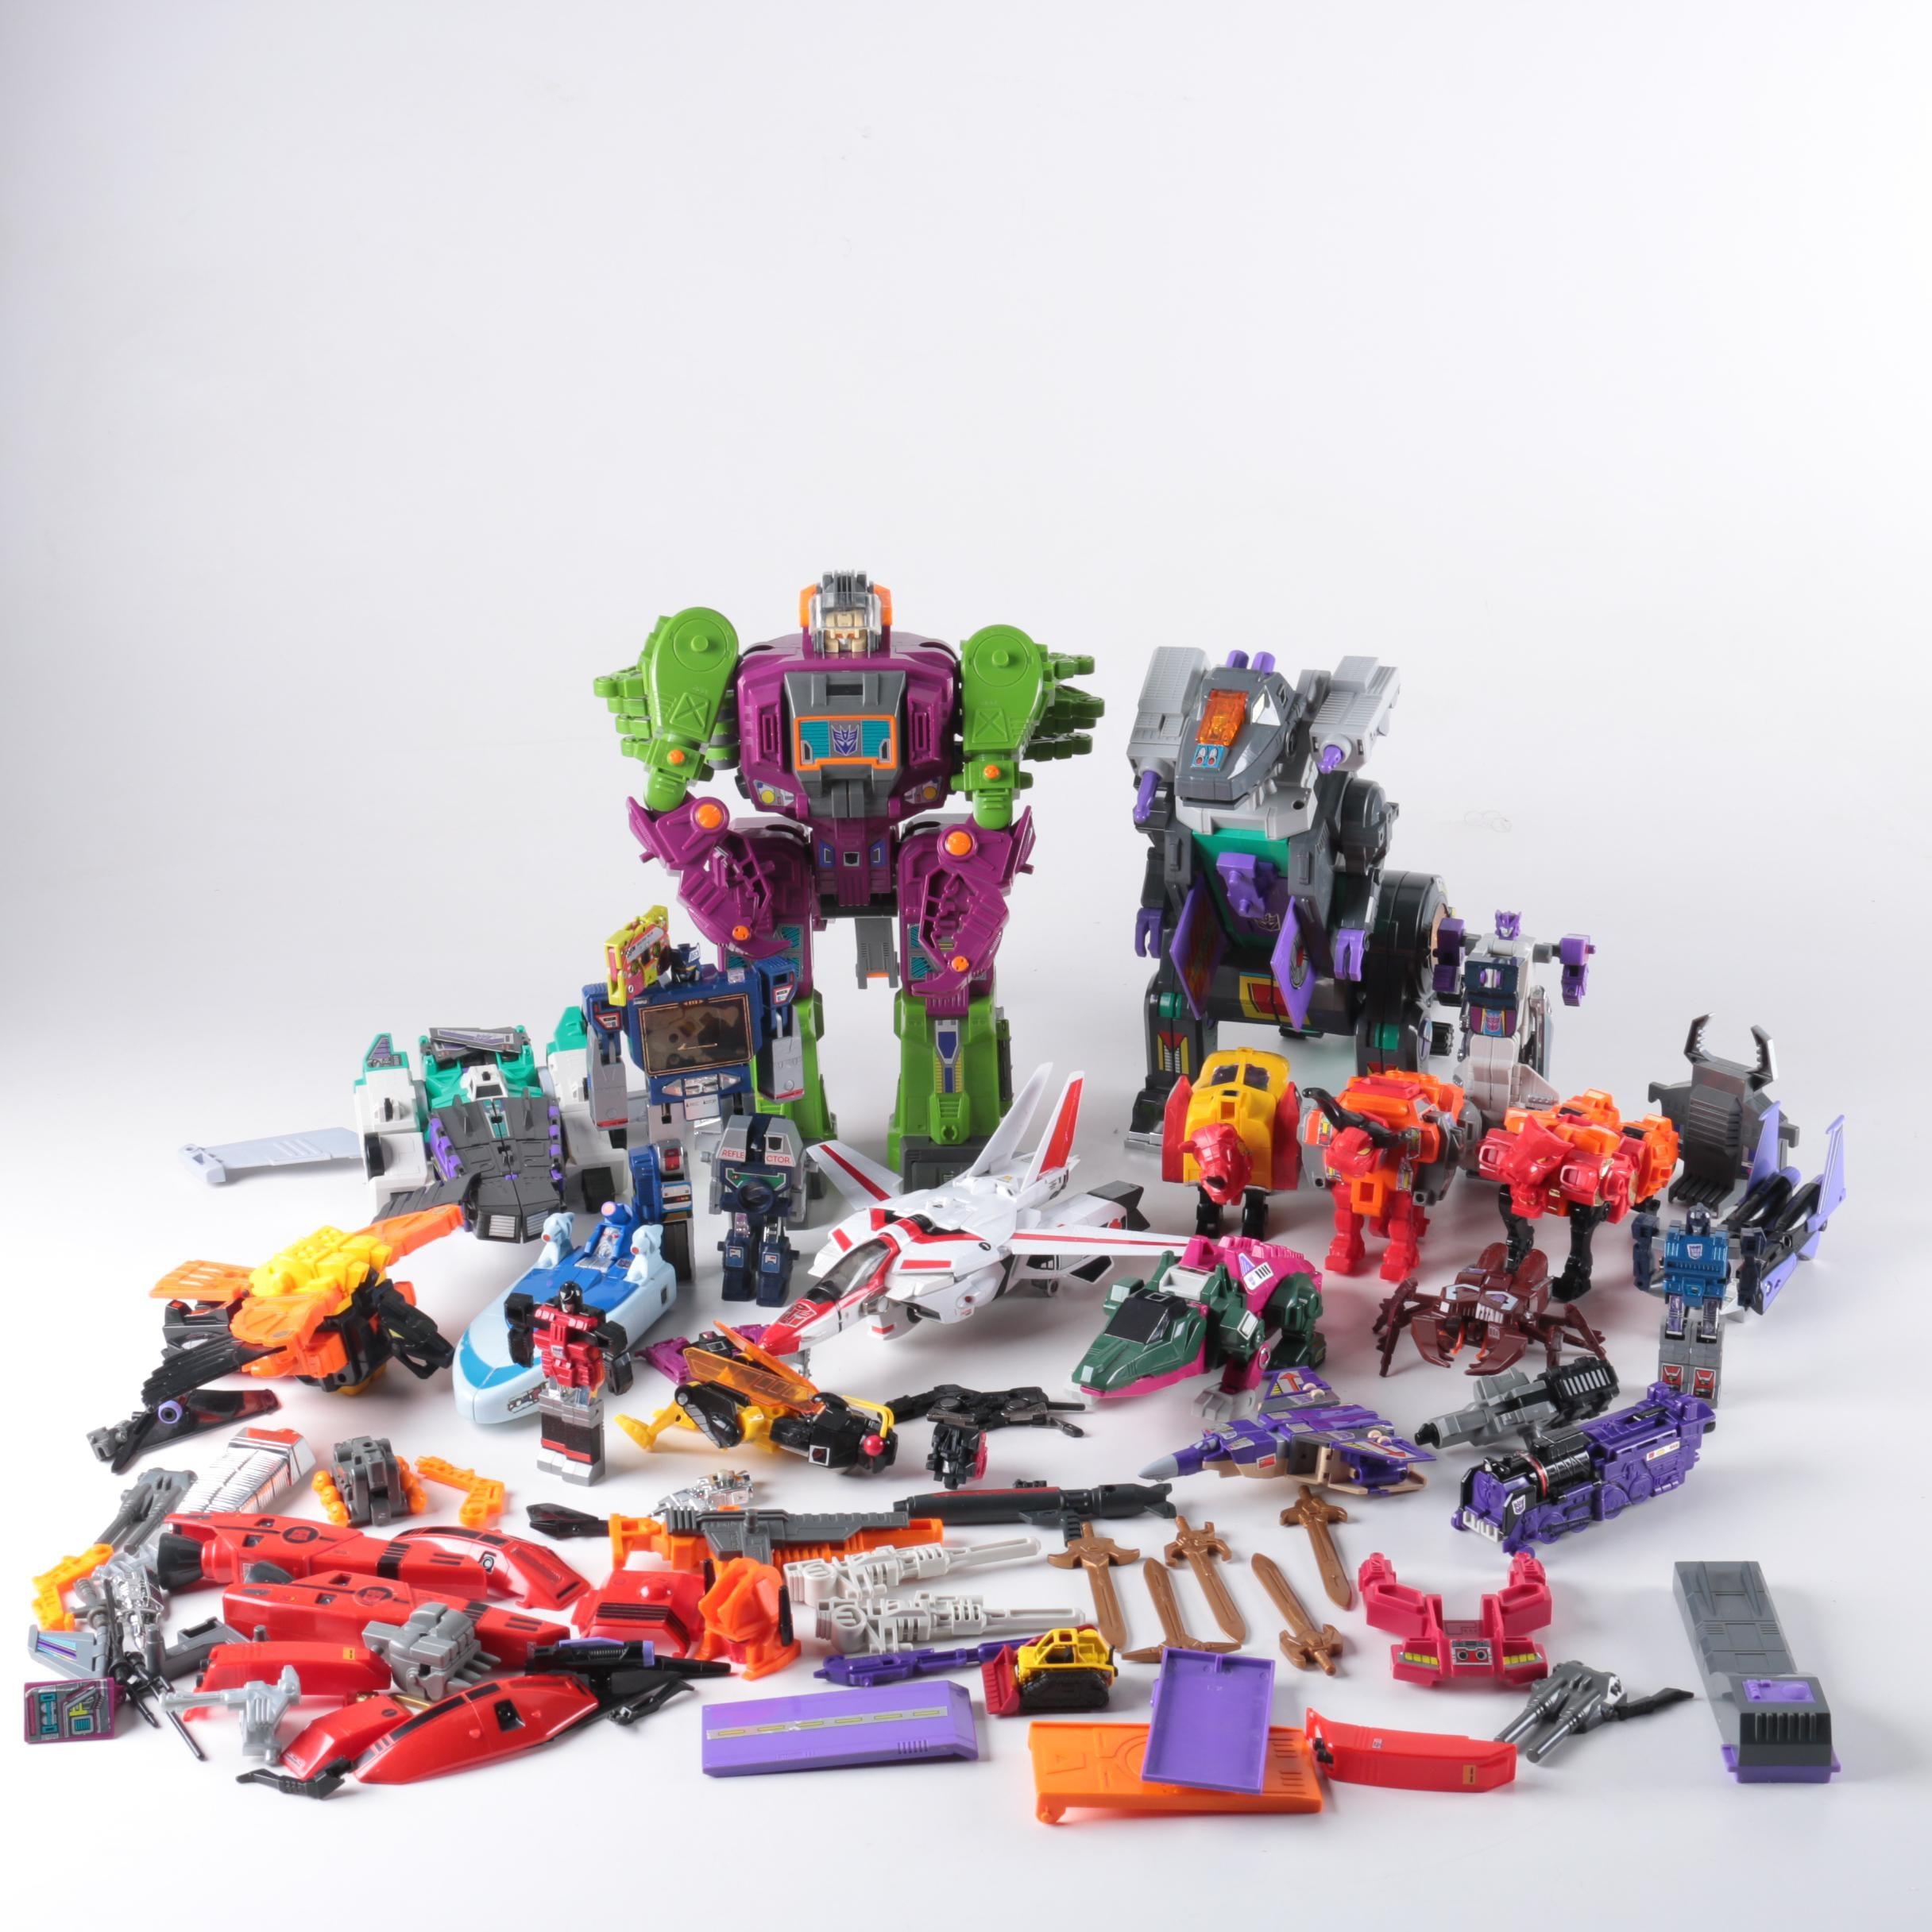 """Transformers"" Toys Including Soundwave"